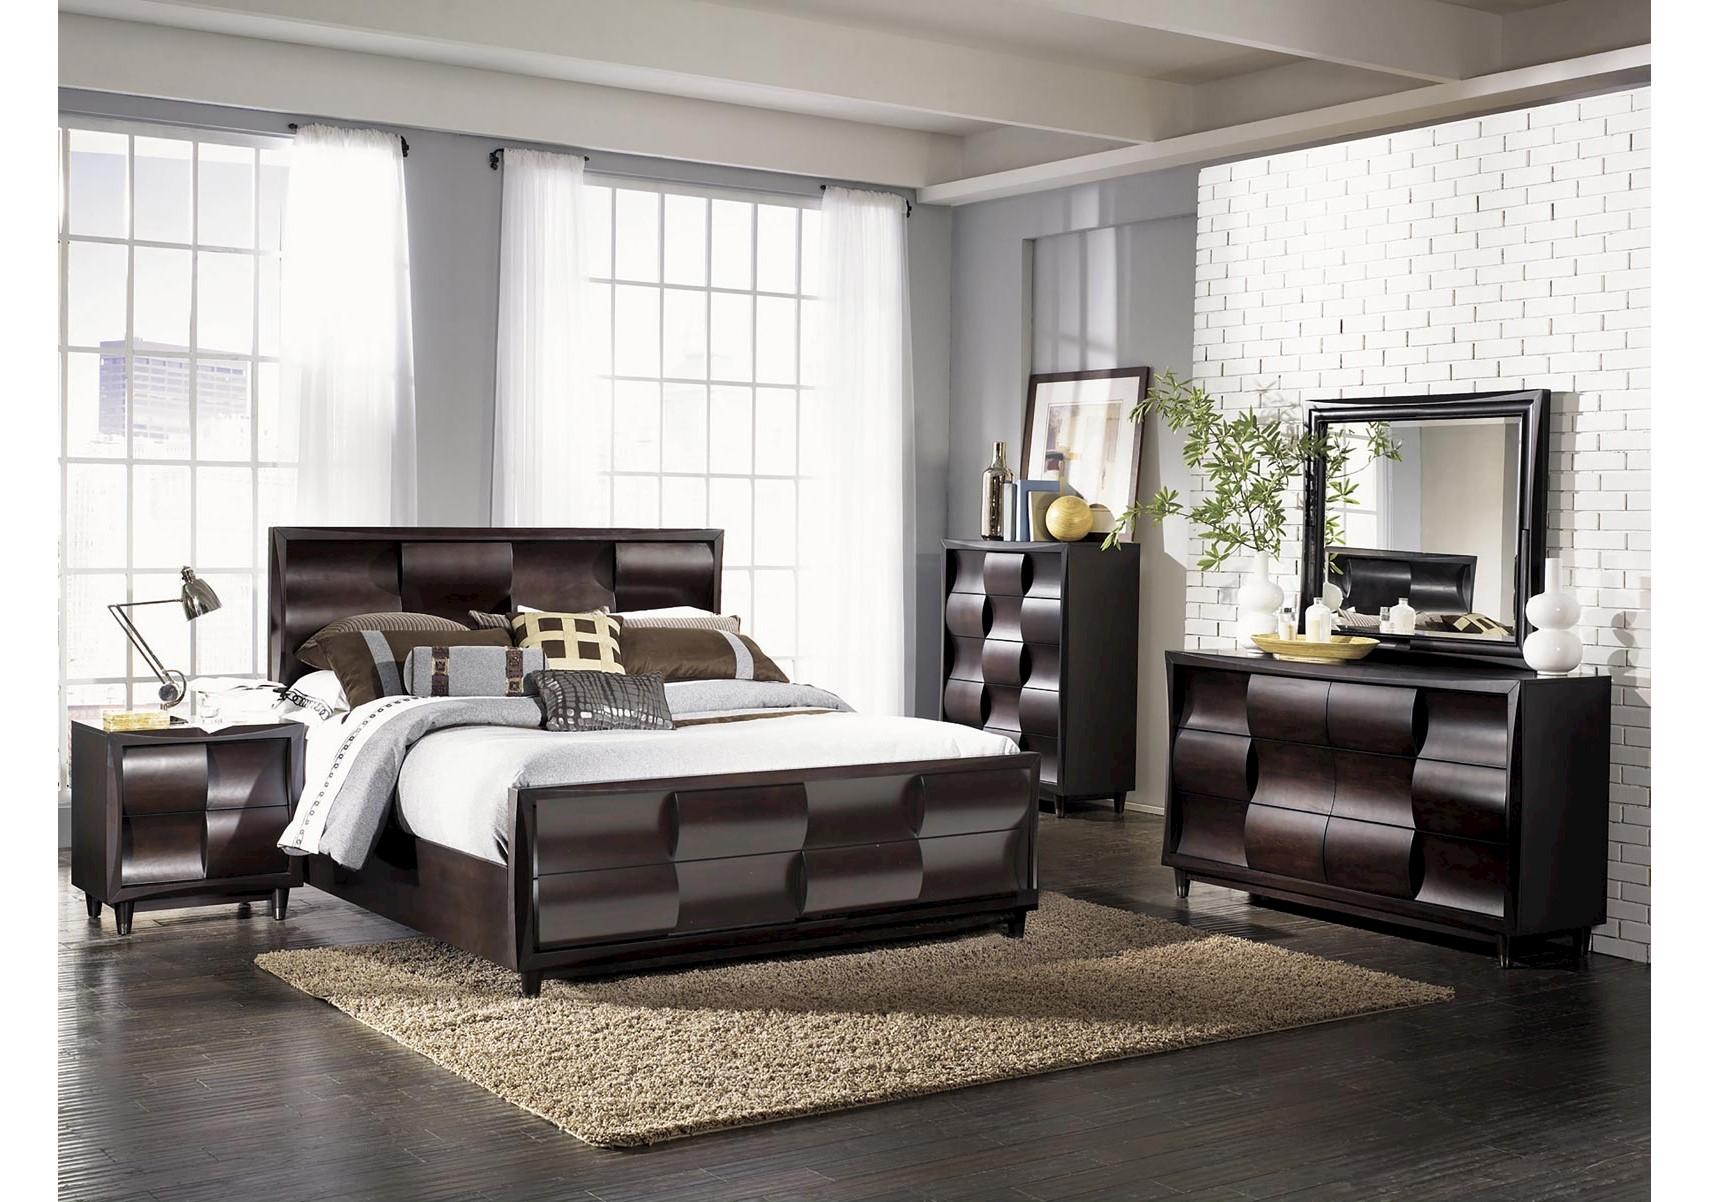 Lacks Bedroom Furniture Sets Top Bedroom Master Decorations Where This Lacks In Furniture Sets